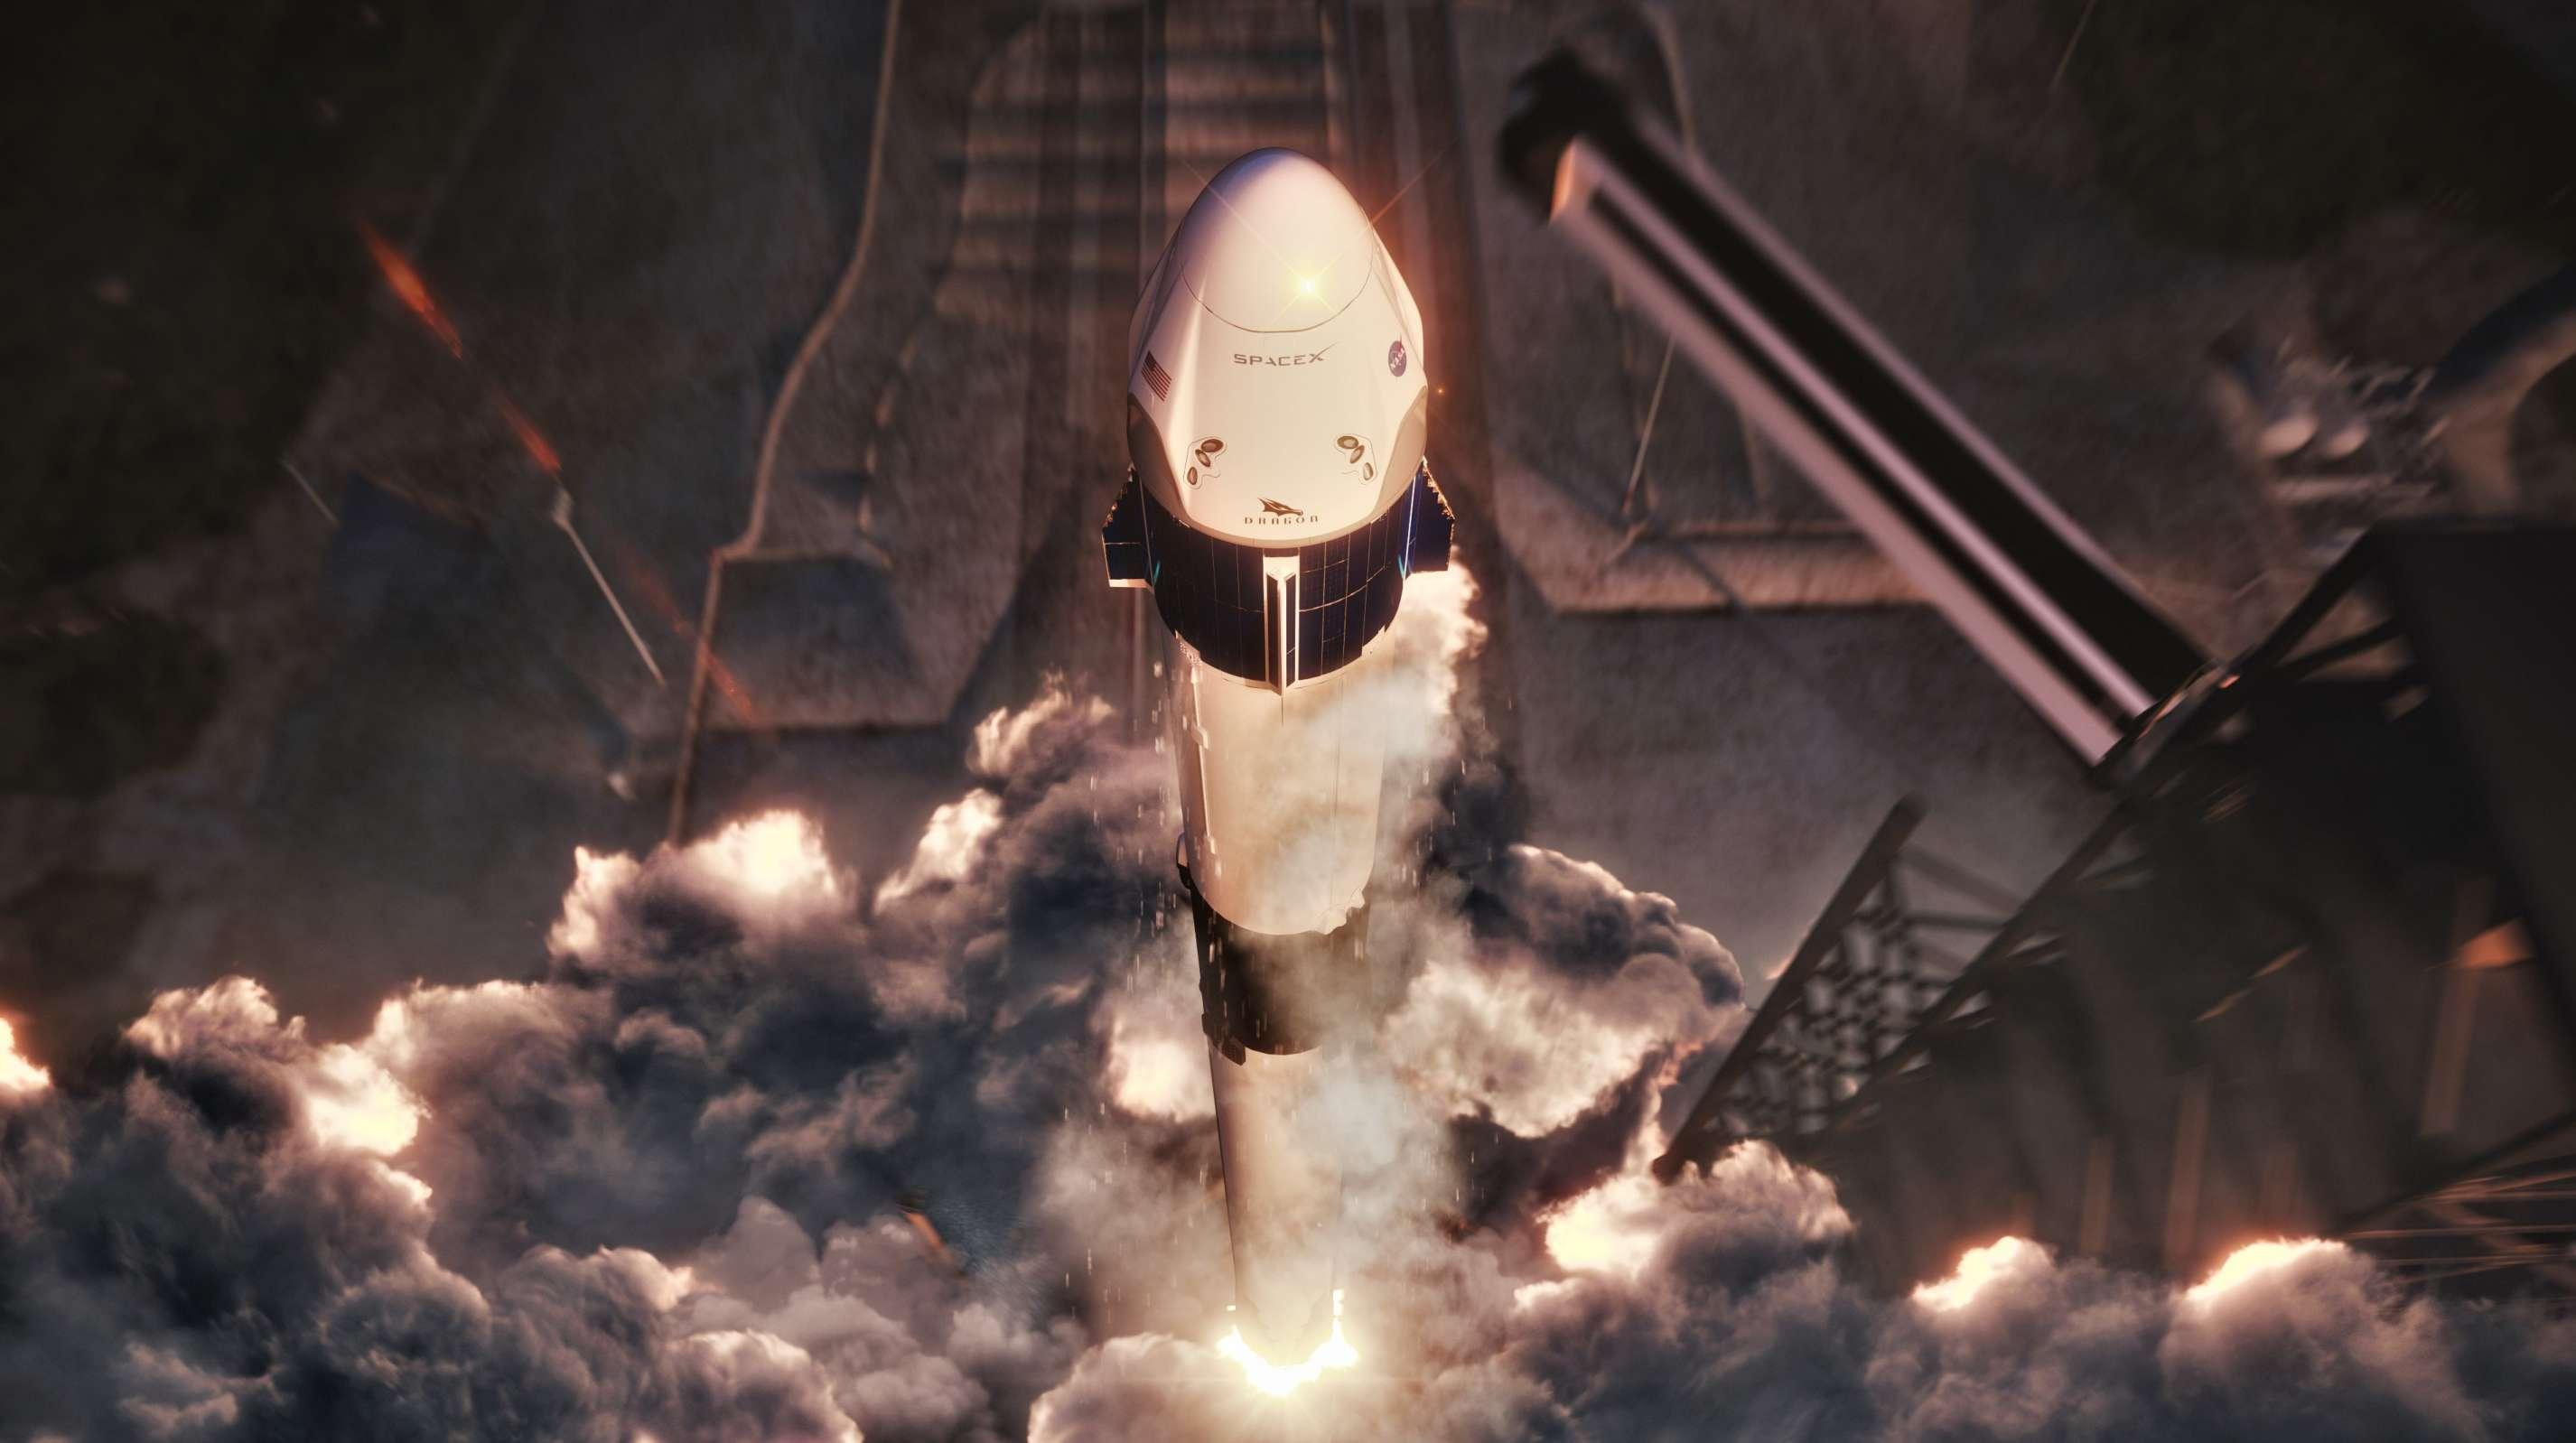 Falcon 9 B1050 Crew Dragon DM-1 liftoff render (SpaceX) 1 (c)